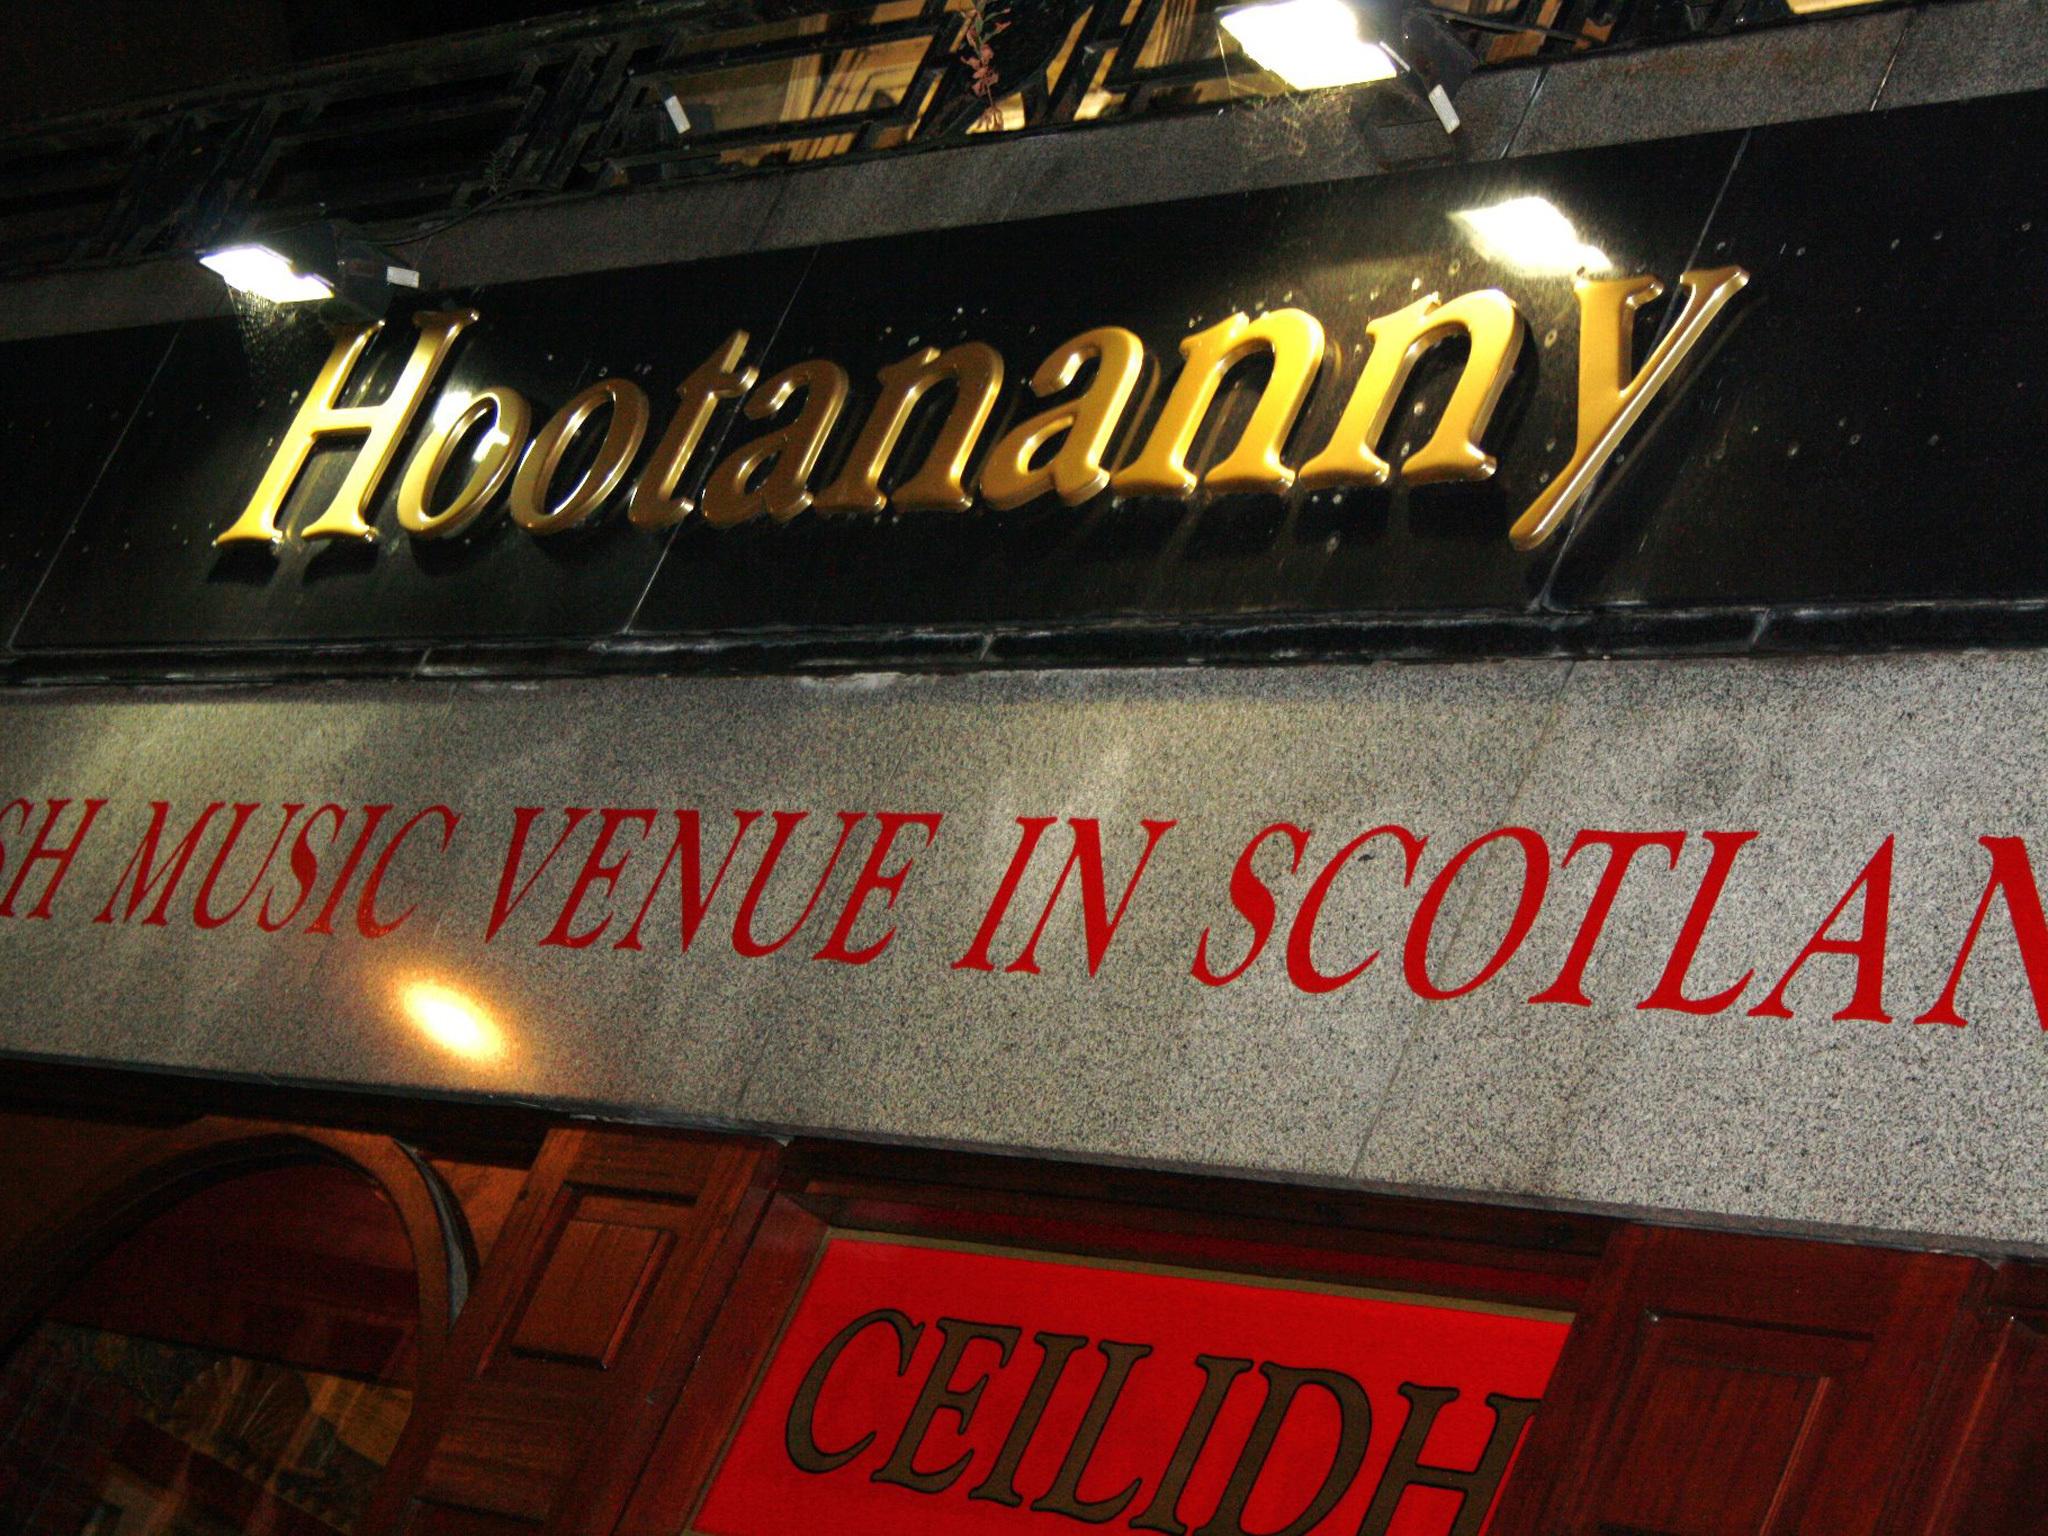 Hootananny TTD Inverness